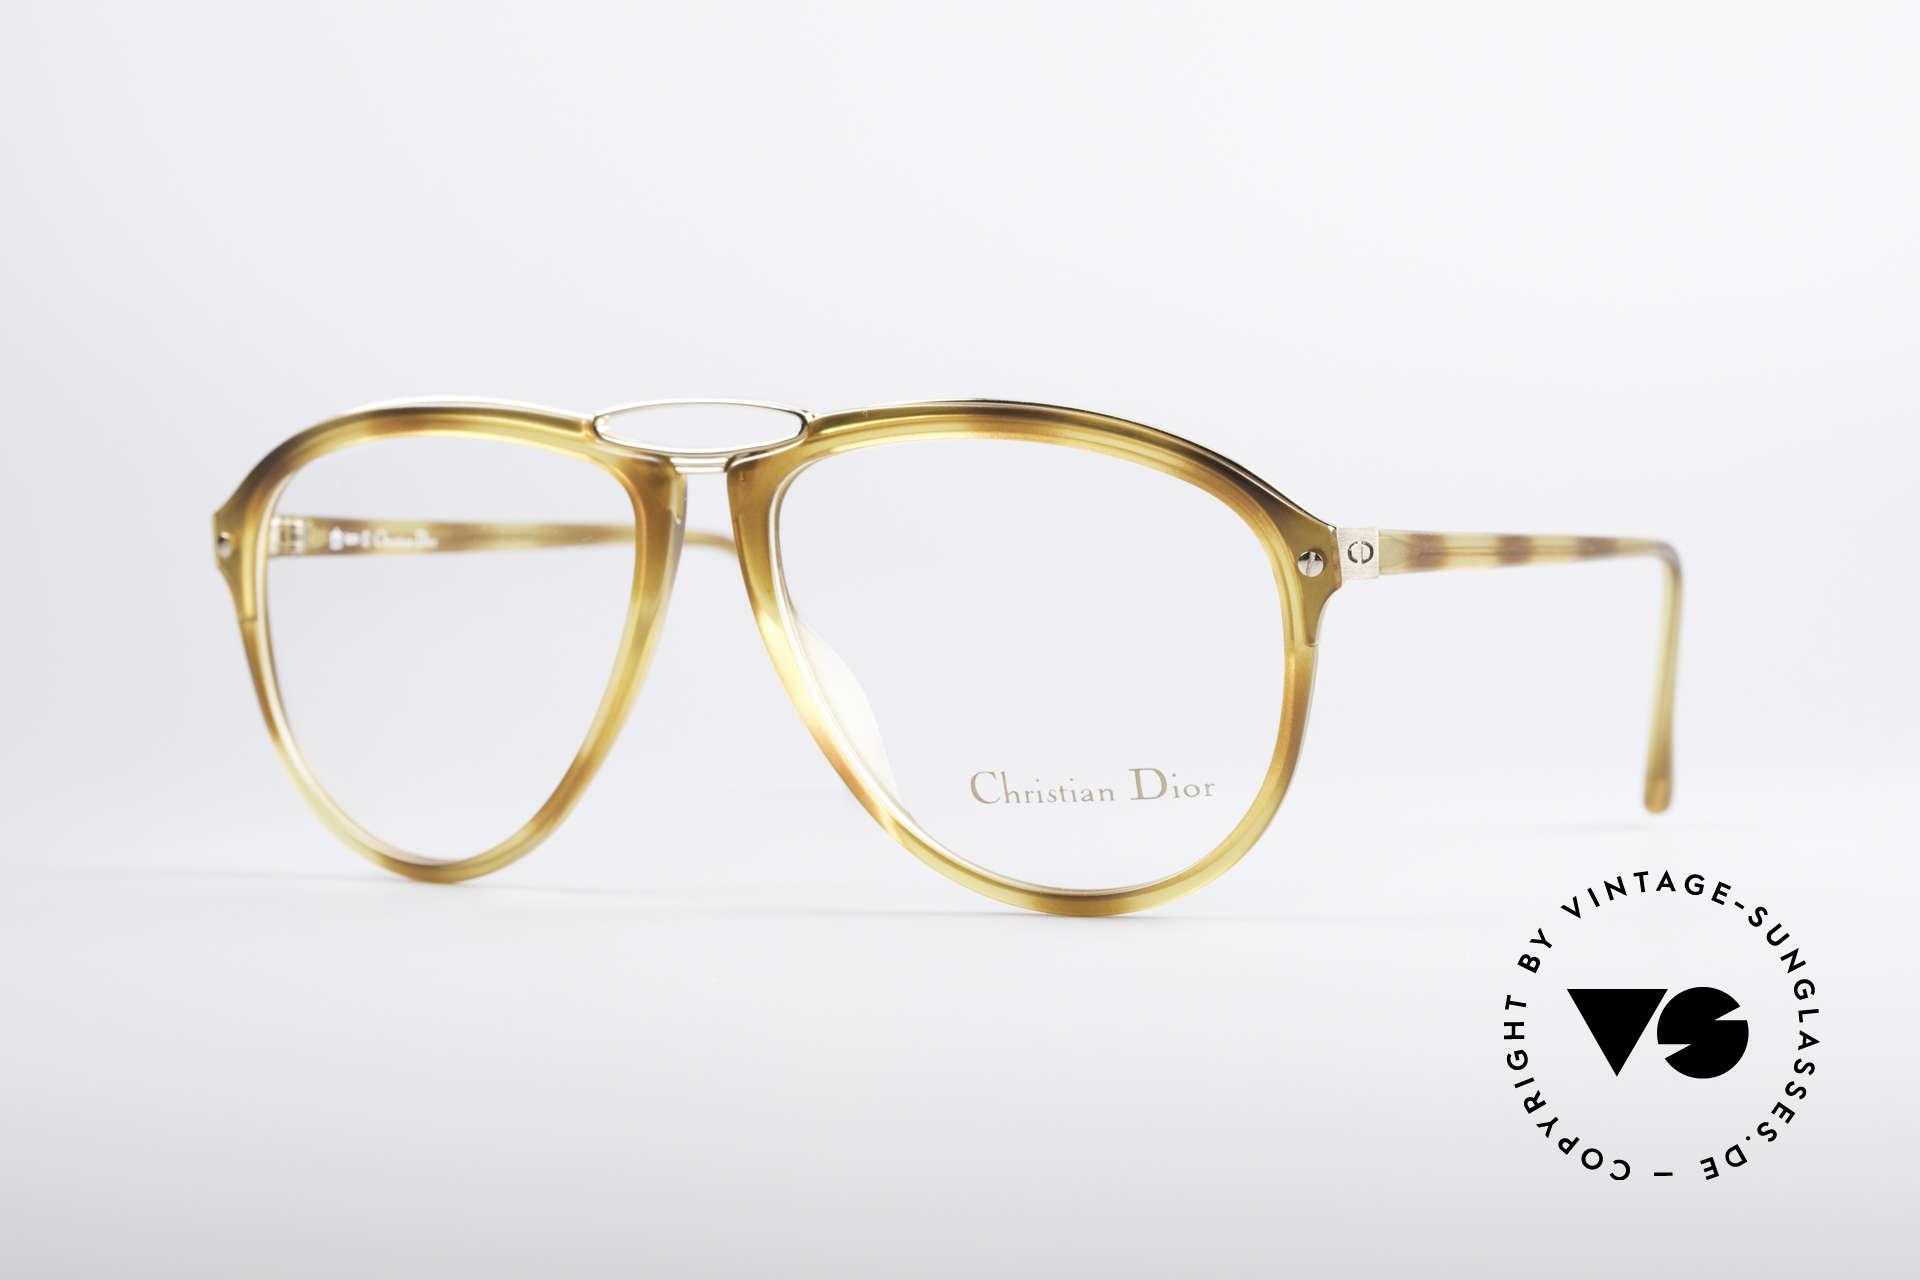 Christian Dior 2523 80's No Retro Glasses Men, unique vintage designer glasses by Christian Dior, Made for Men